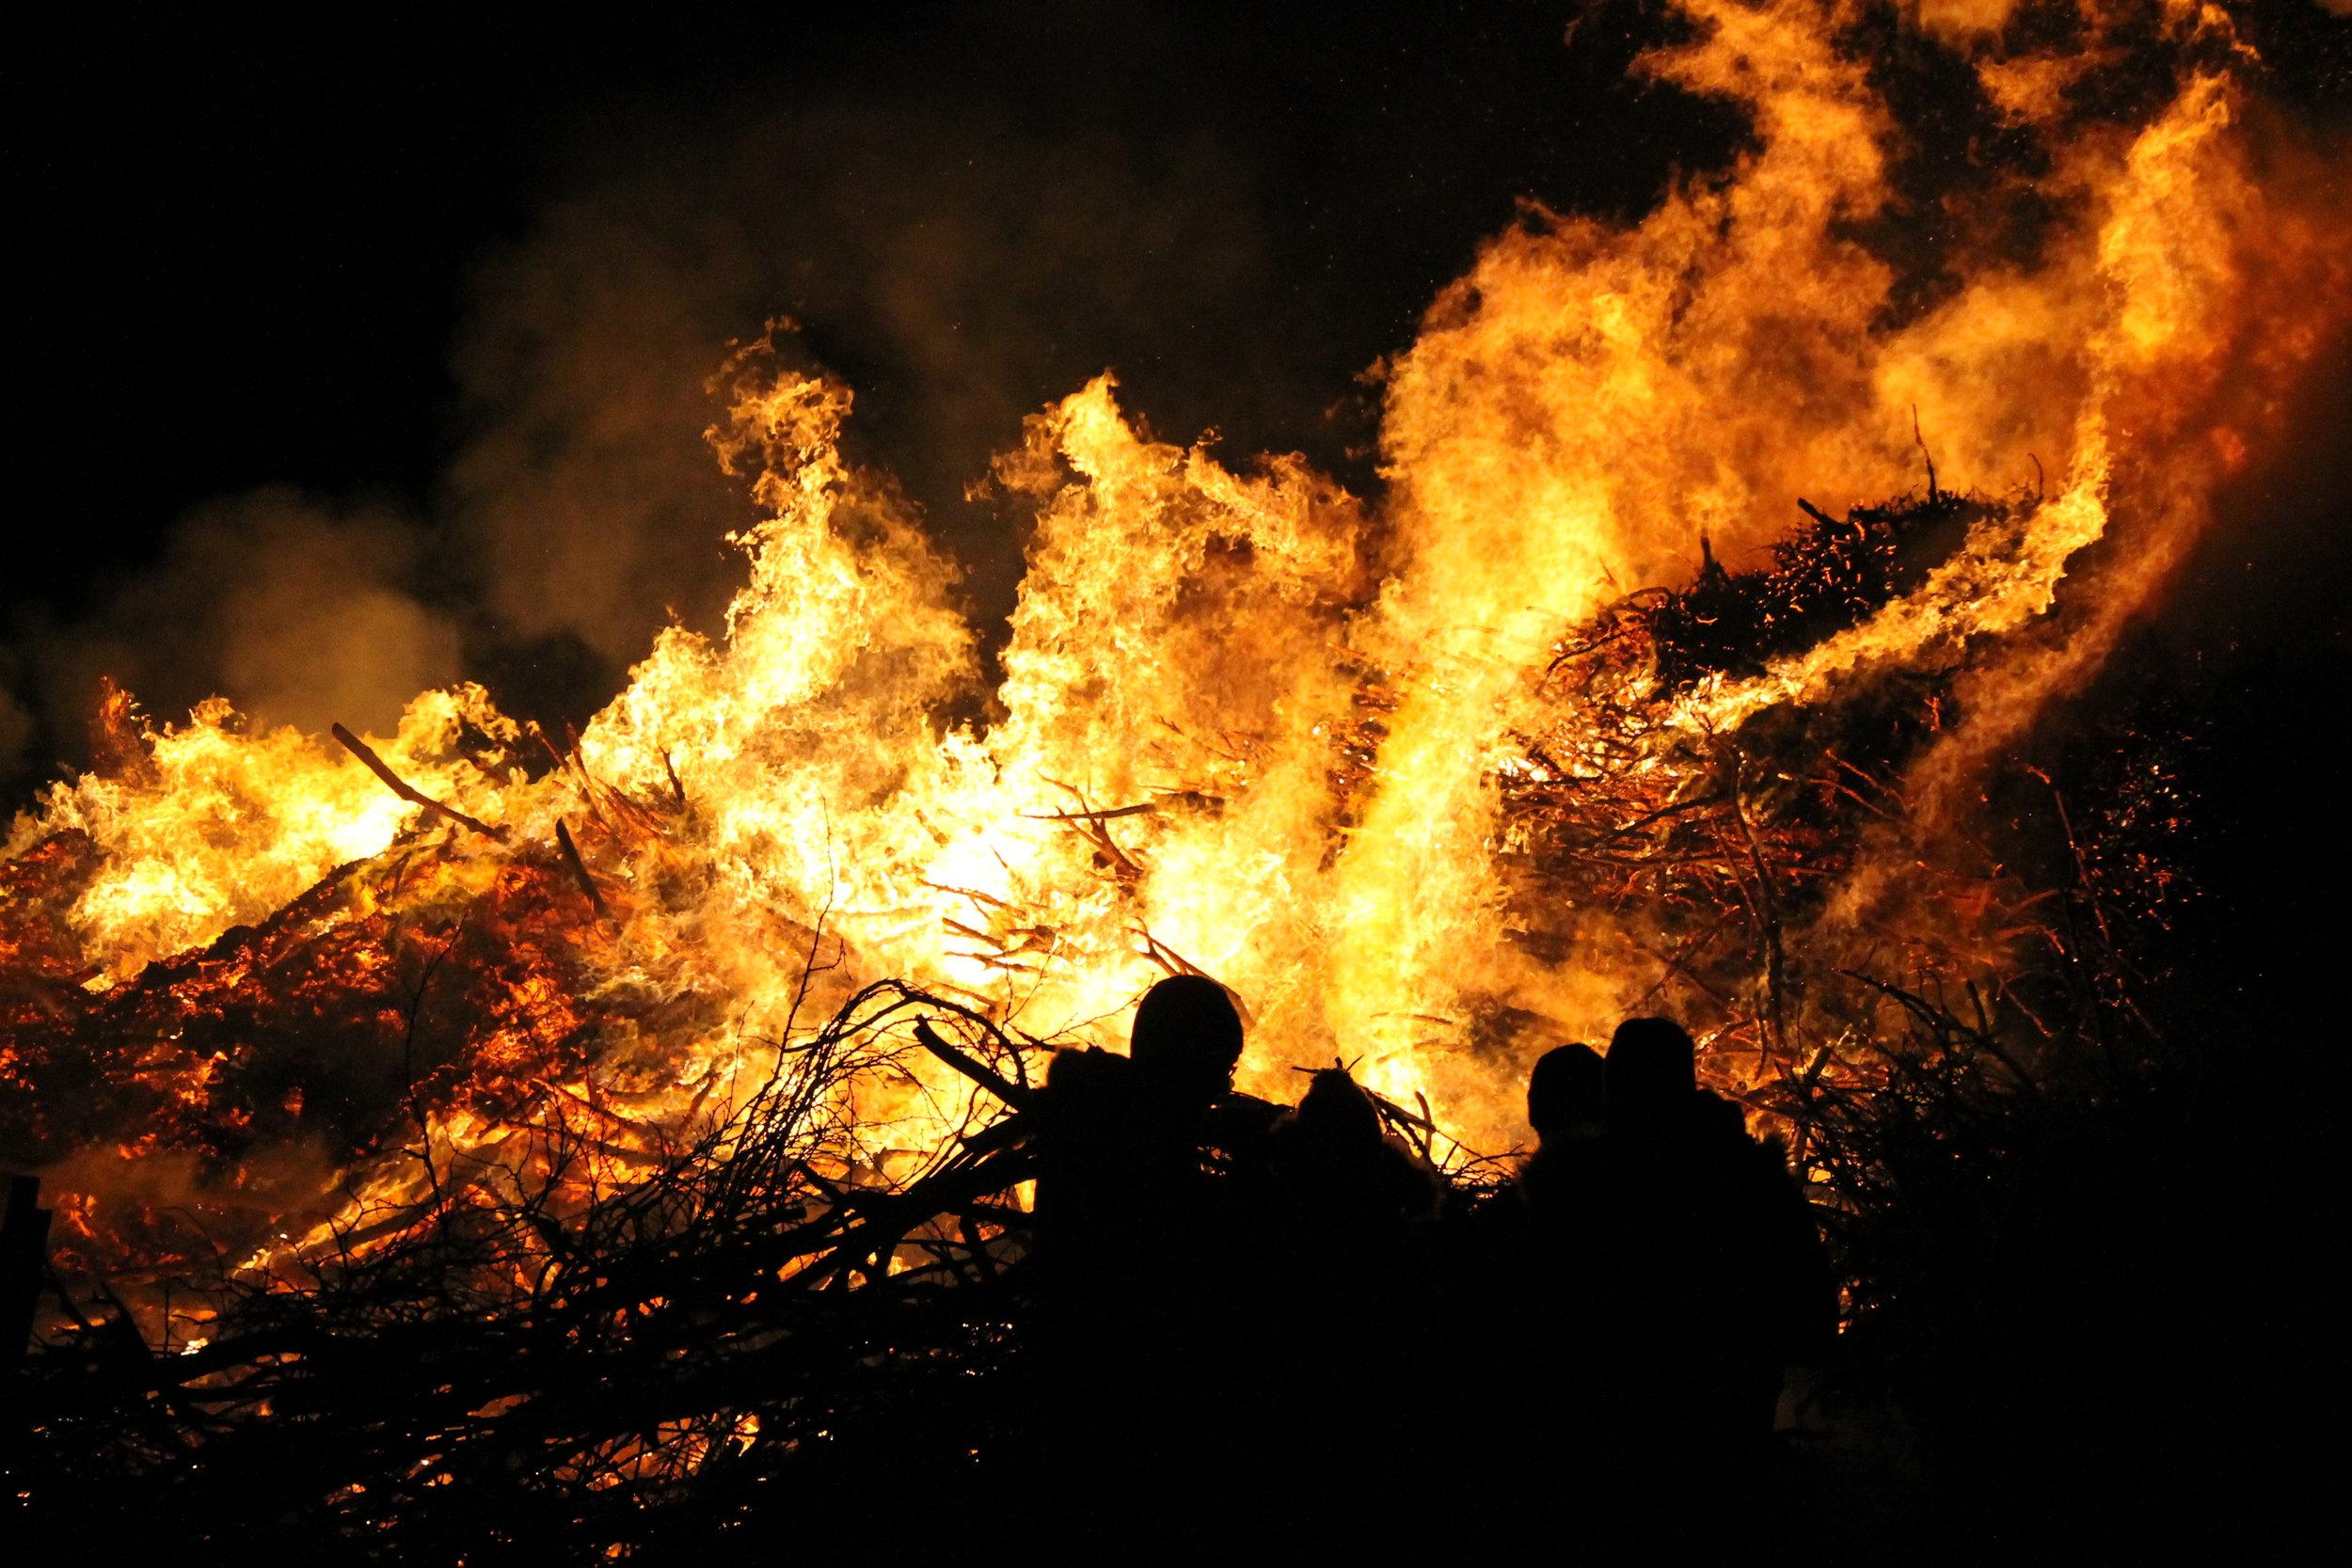 Biike Feuer in Nordfriesland